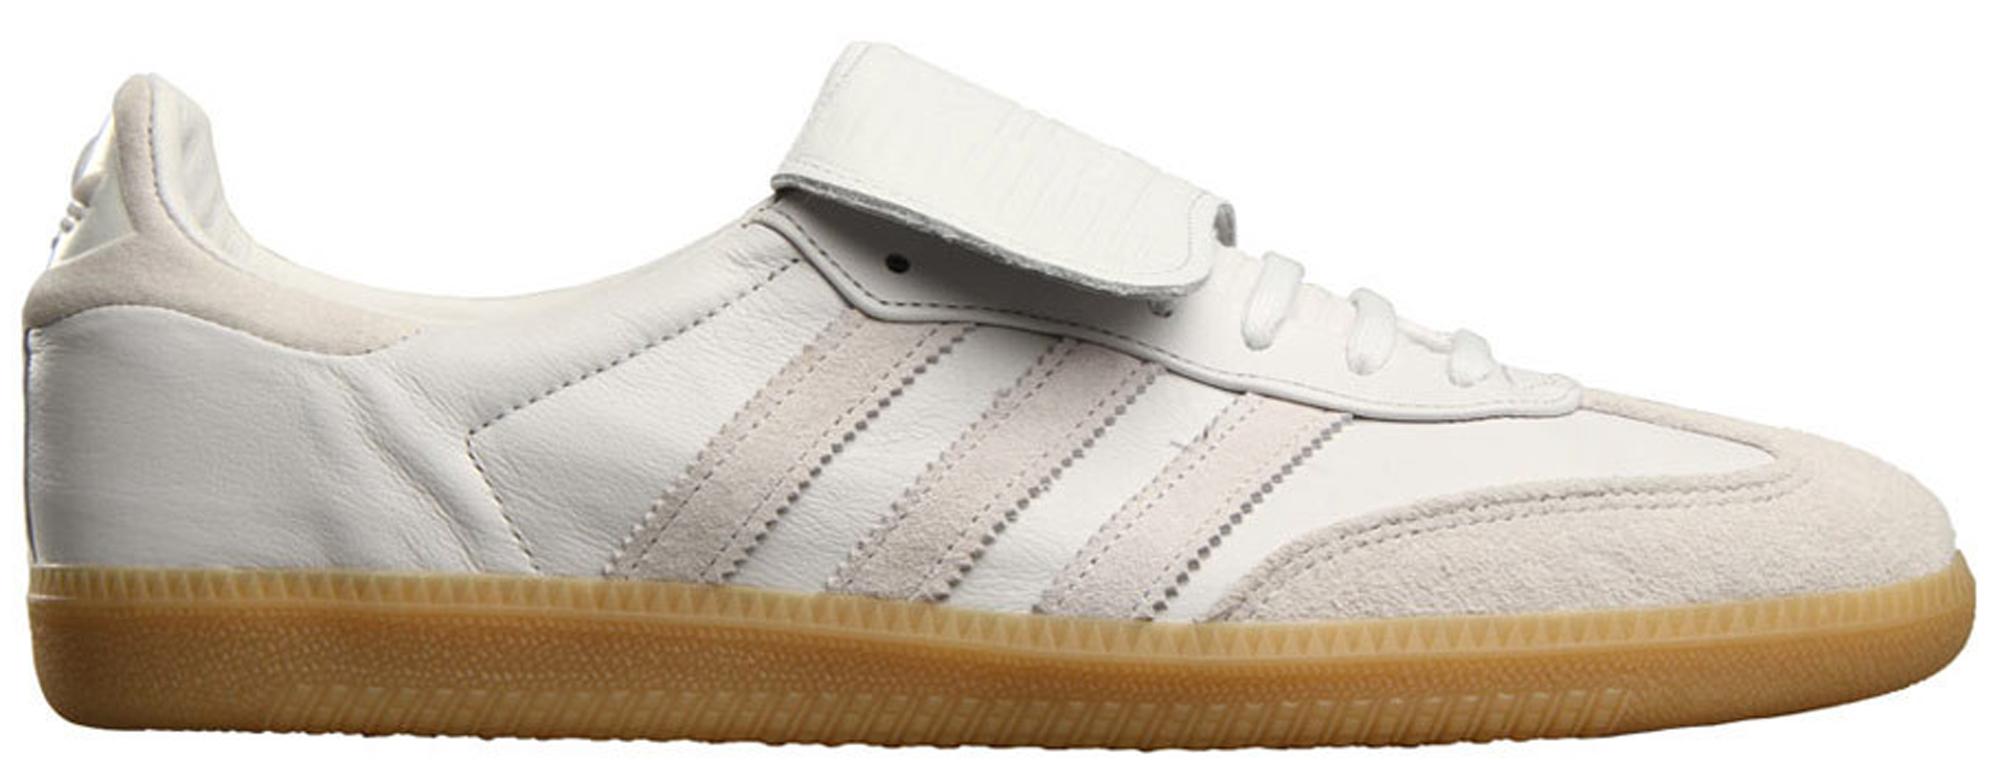 adidas Samba Recon LT White Gum